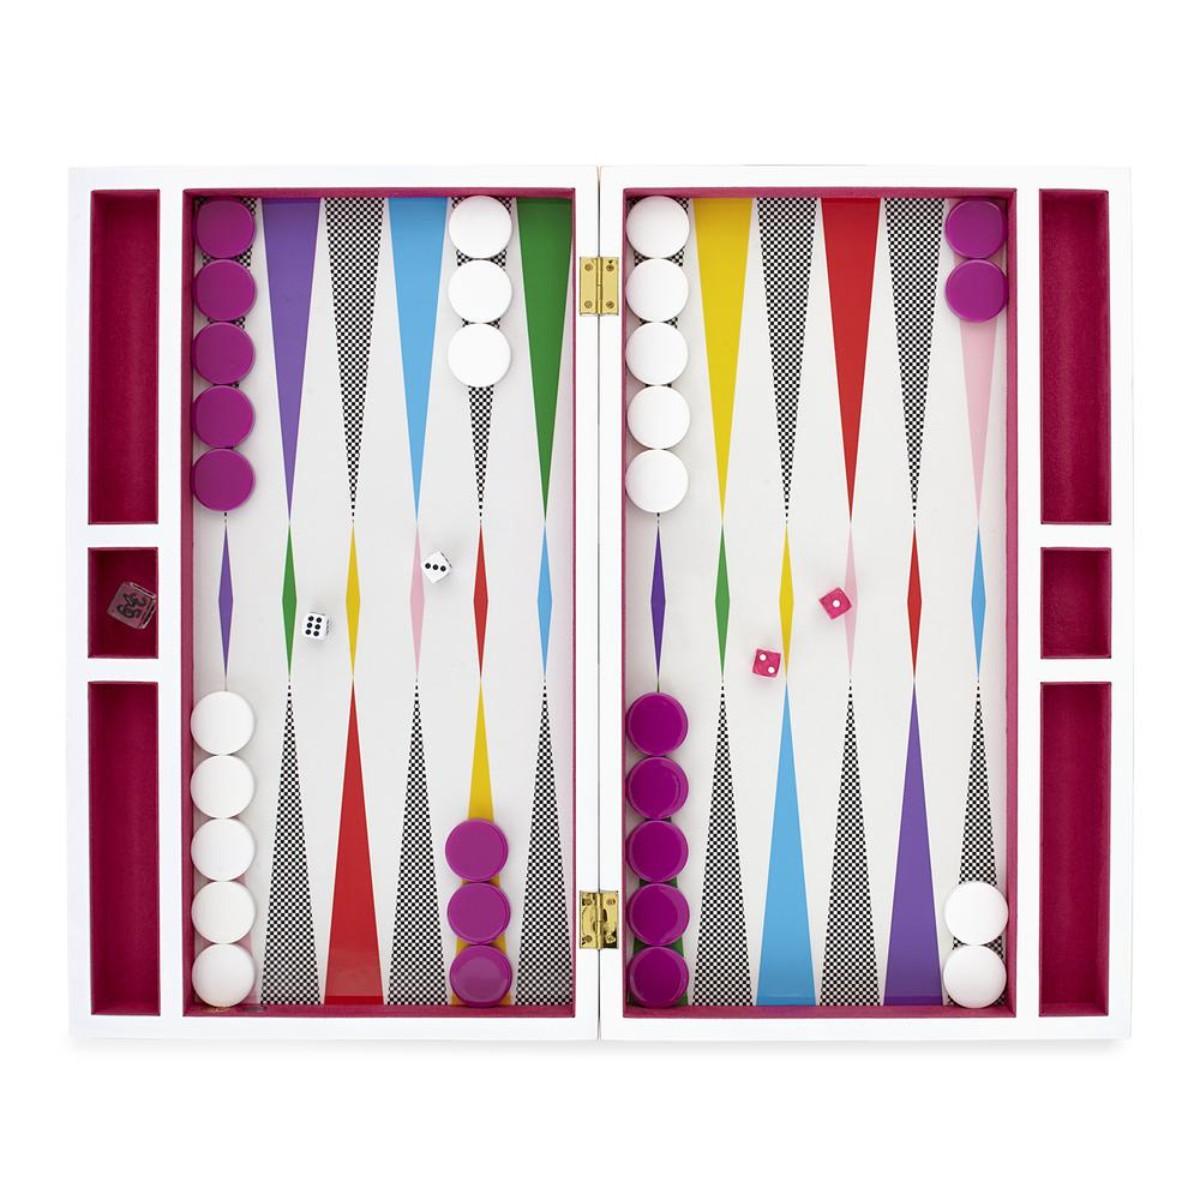 Jonathan Adler I Checkerboard Backgammon Set